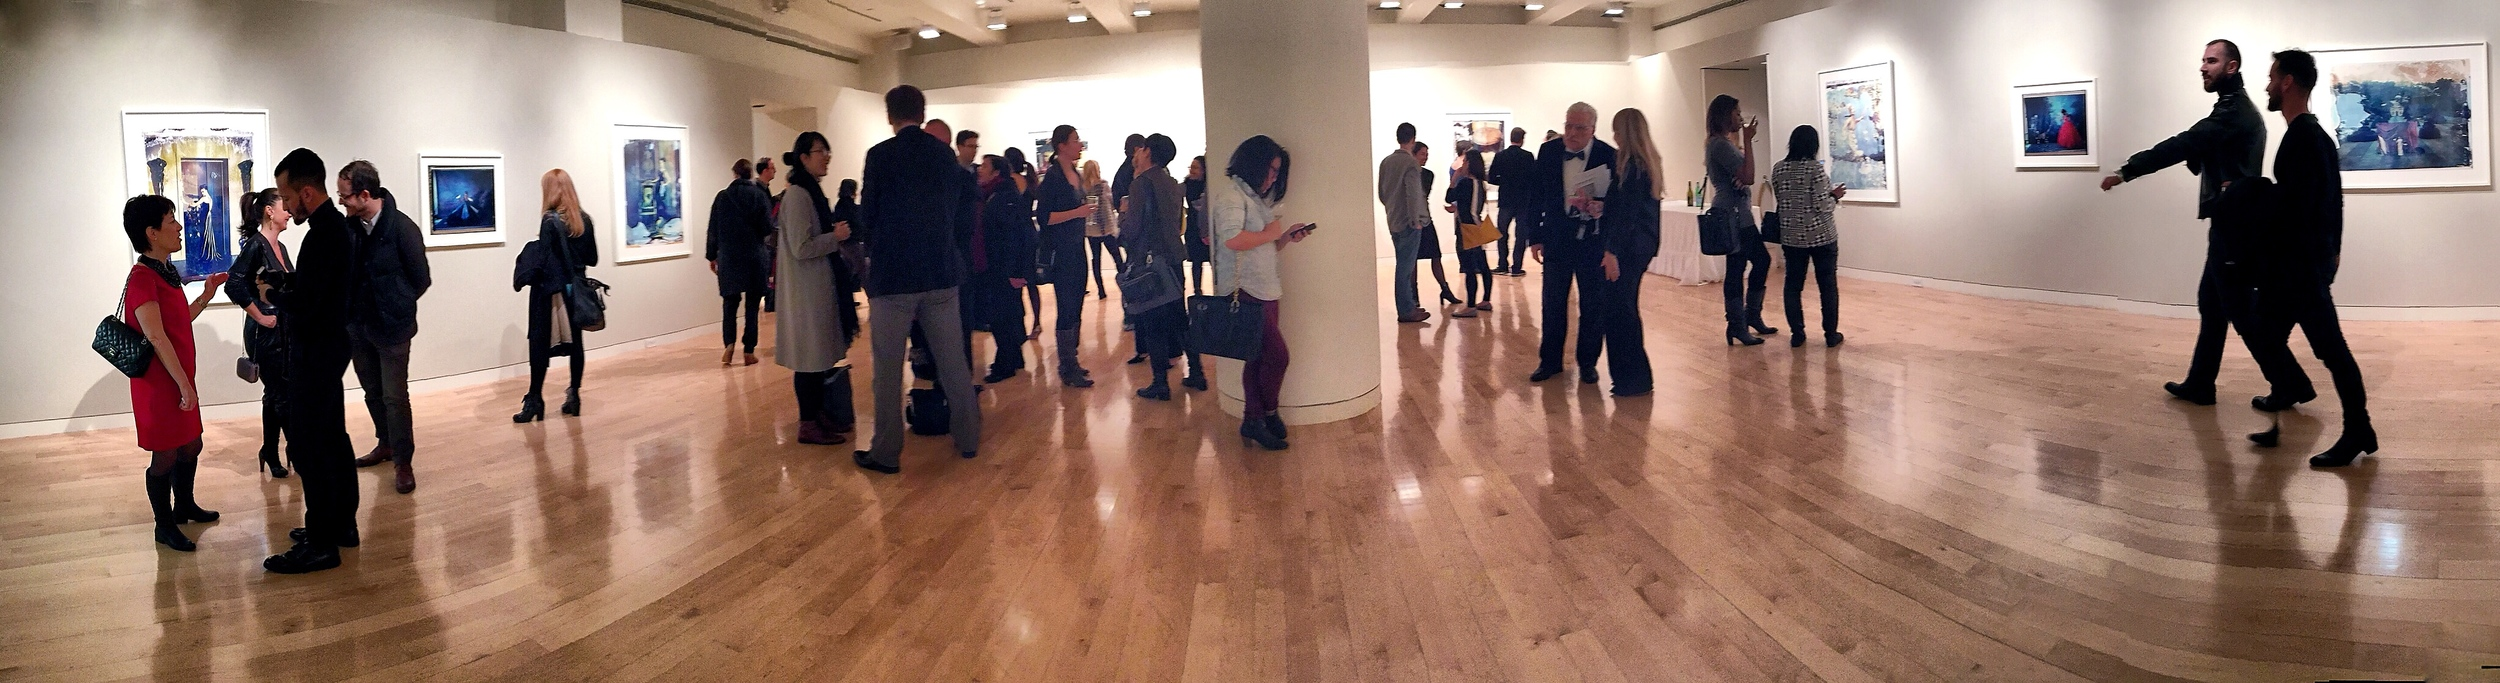 Opening reception with  Cathleen Naundorf's  photographs at  Edwynn Houk Gallery .